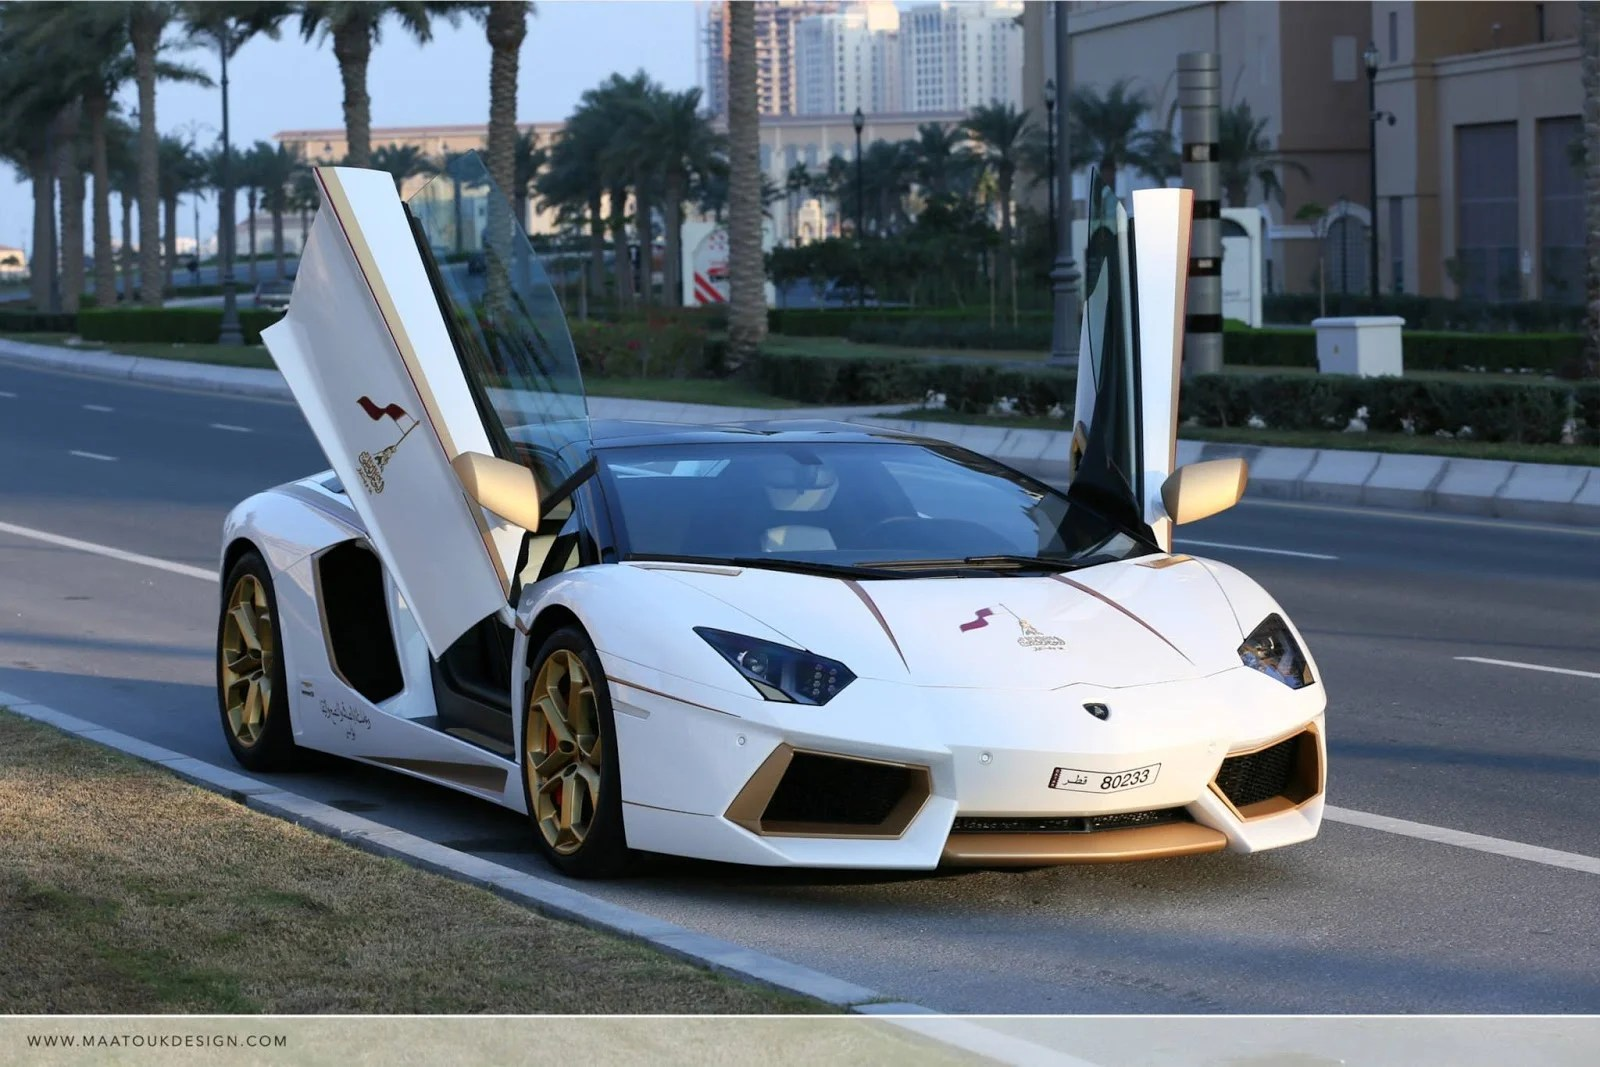 Meet the oneoff gold plated Lamborghini Aventador